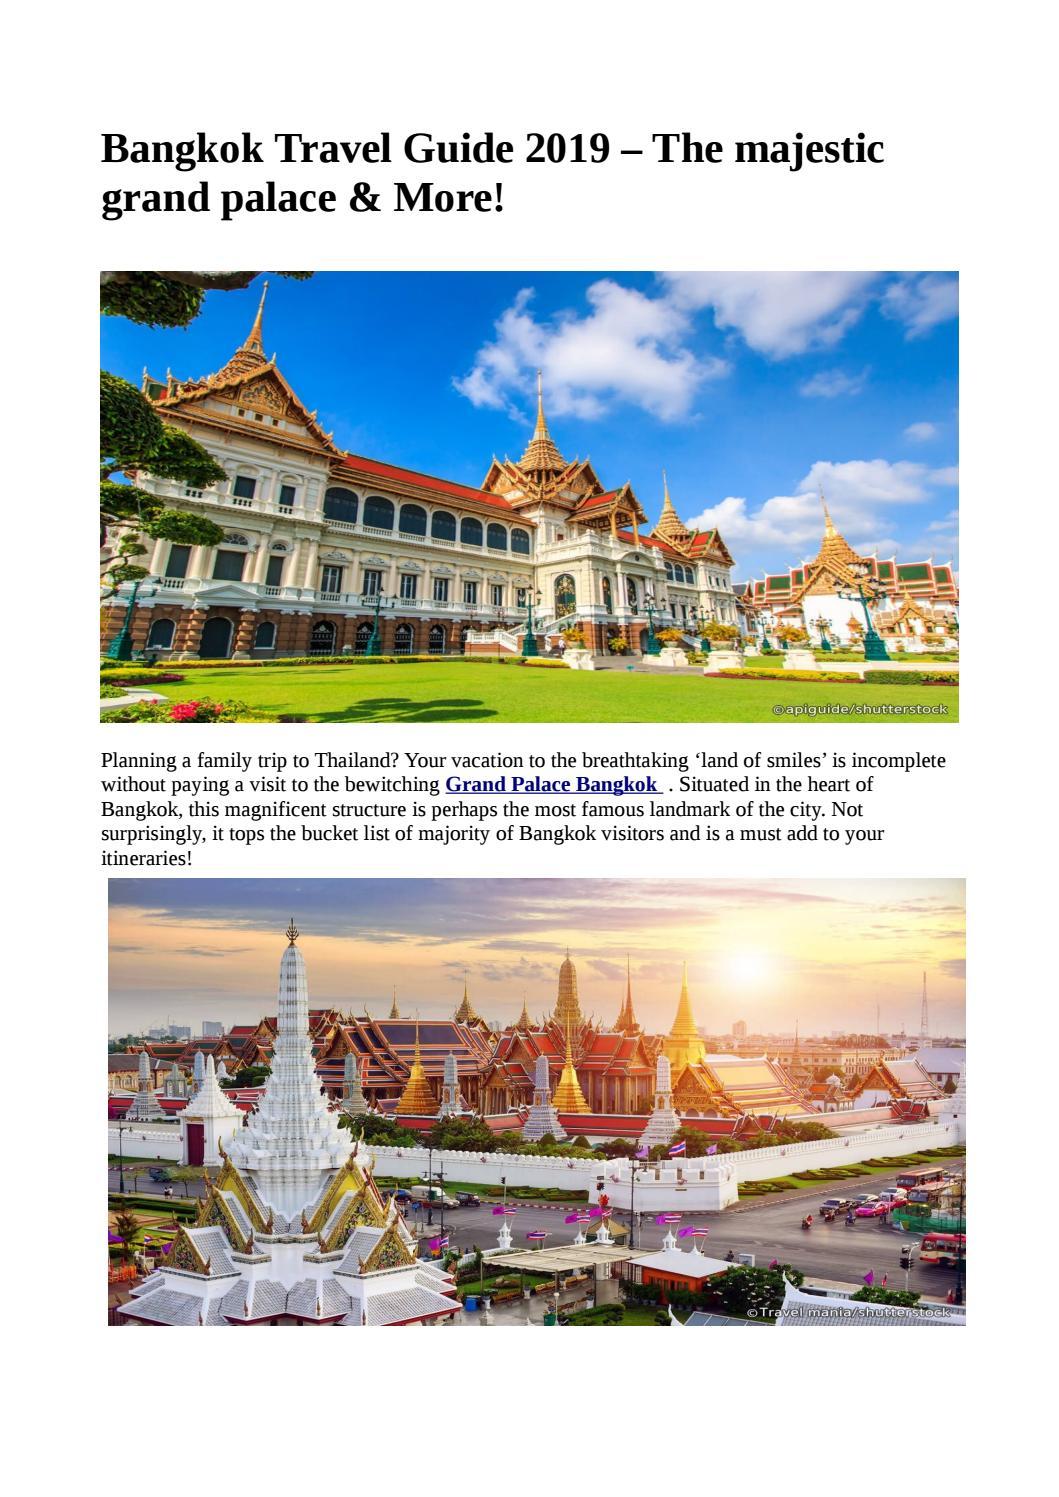 Bangkok Travel Guide 2019 – The majestic grand palace & More